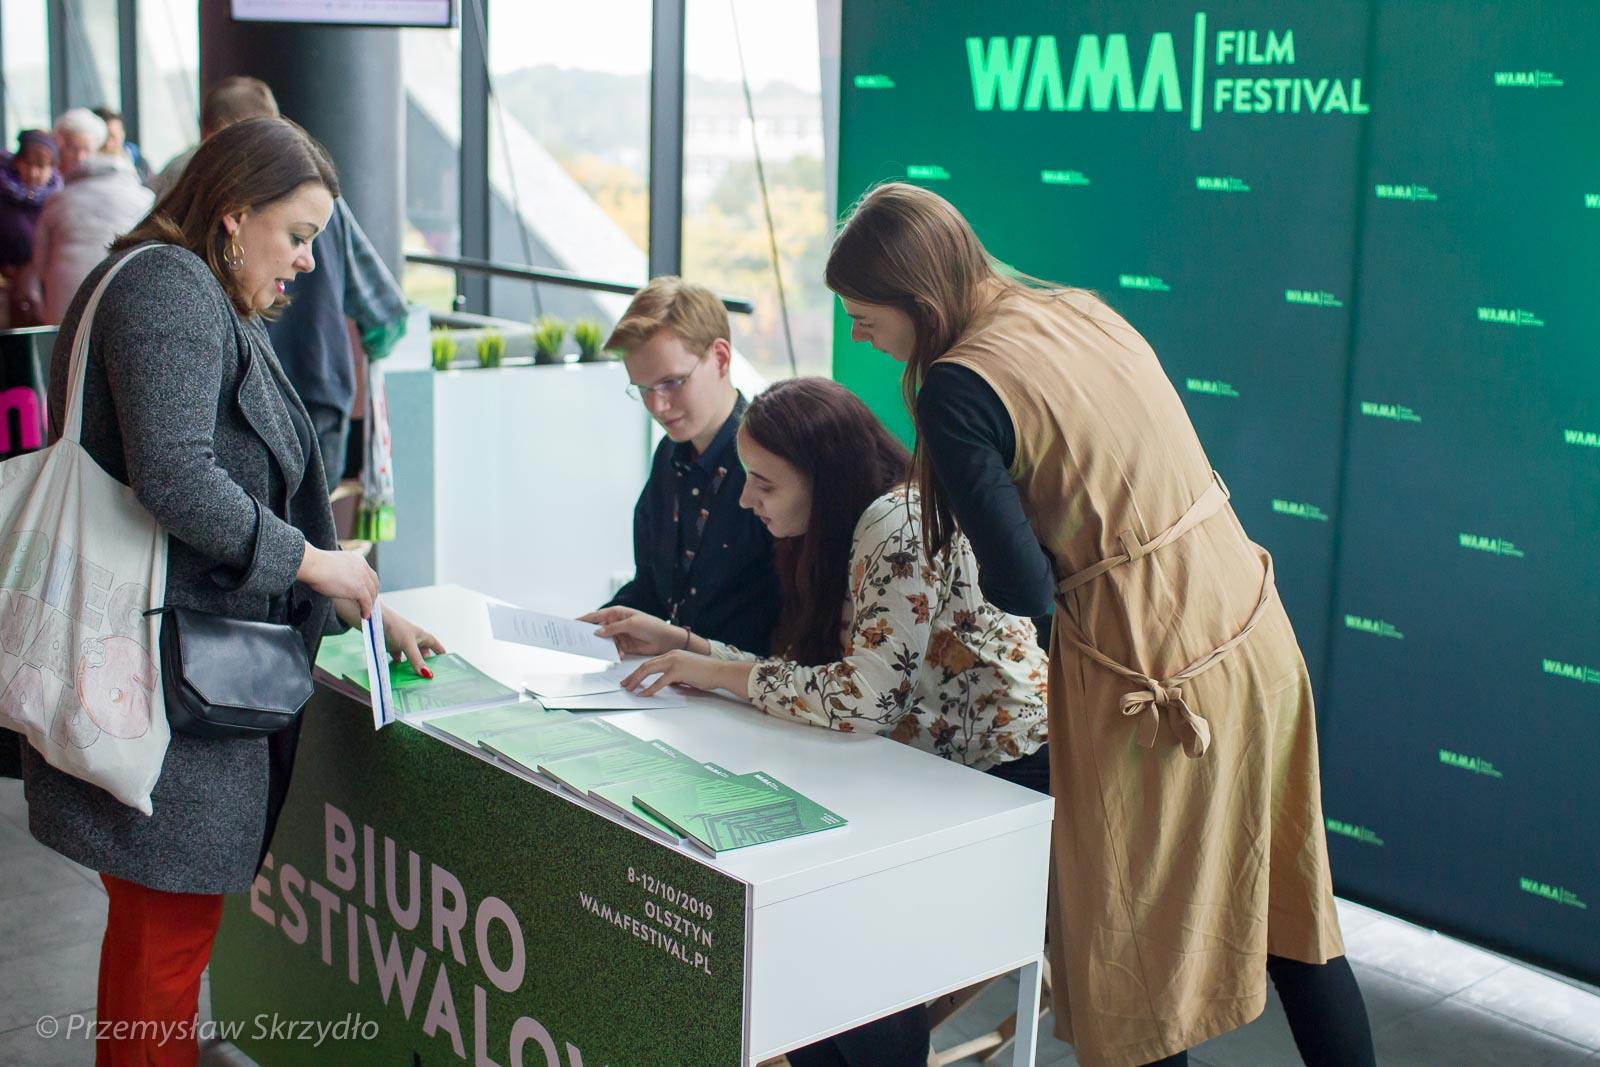 WAMA Film Festival 2019